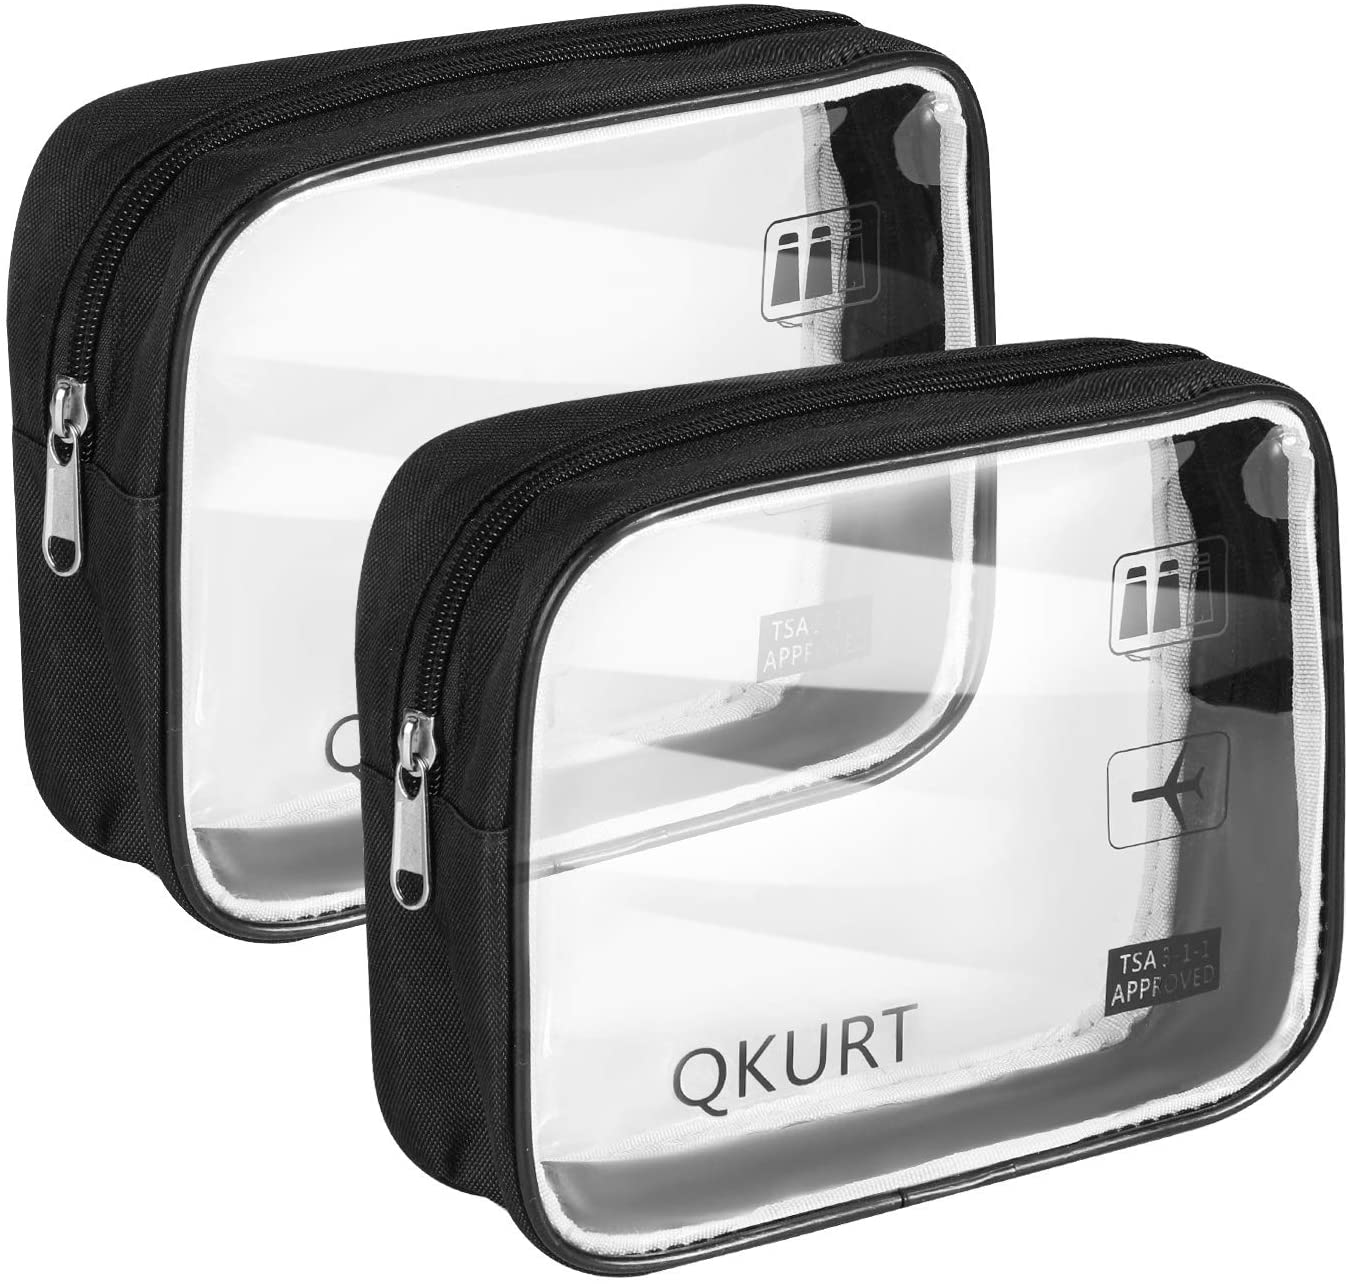 QKURT 2pcs/Pack Transparent Waterproof Toiletry Bag Travel Luggage Pouch, Portable PVC Clear Cosmetic Makeup Bag Pouch for Bathroom, Excursion| Practical Transparent Makeup Bags